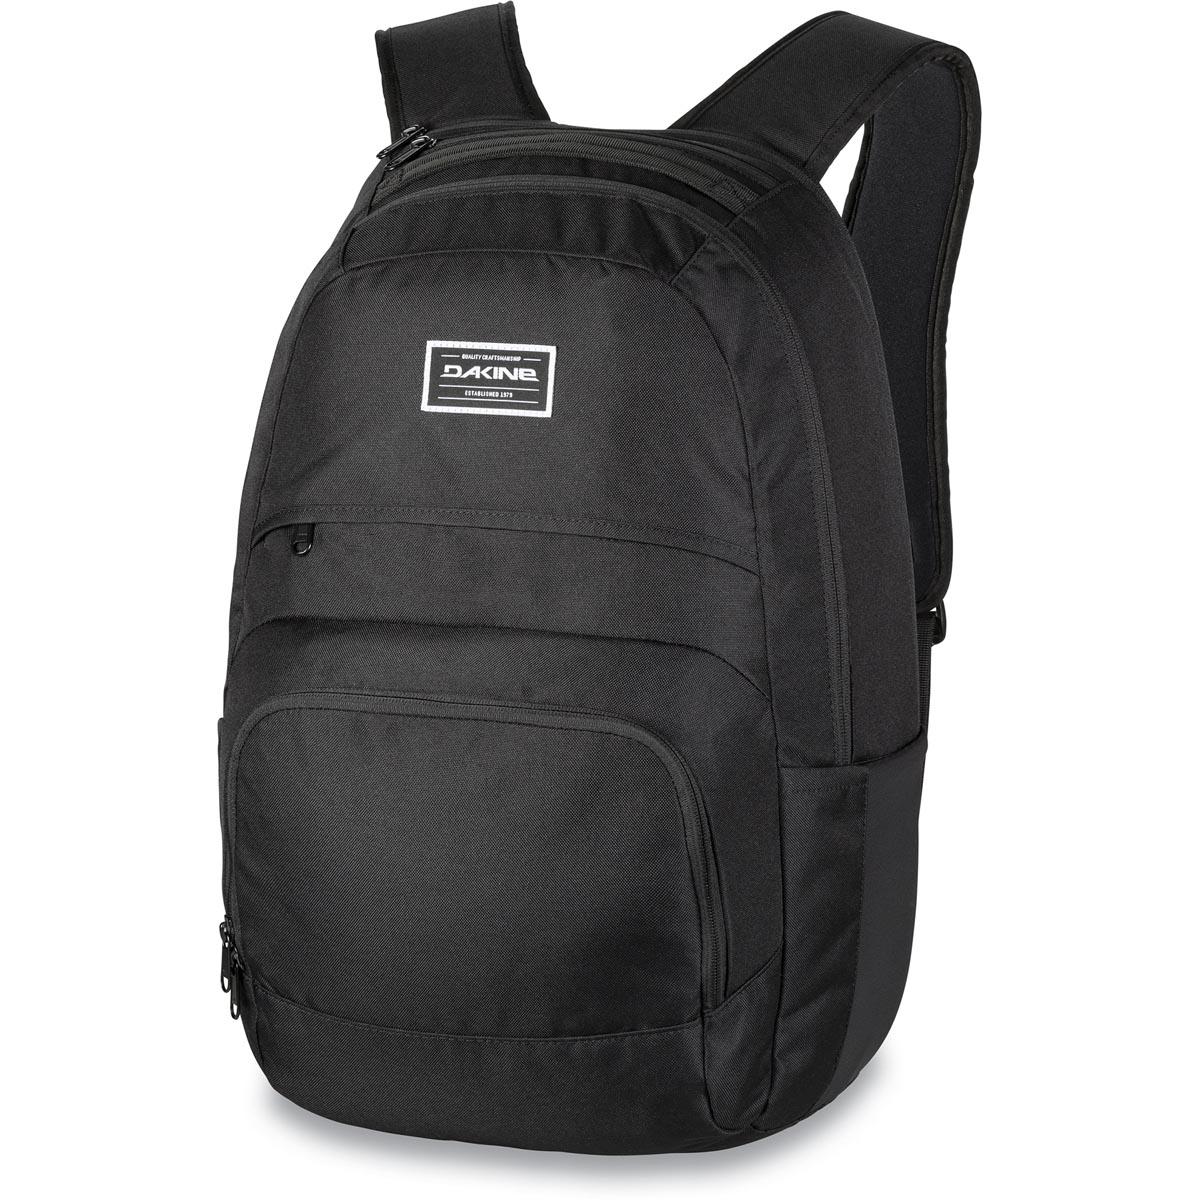 c1d04d0a6ec3f Dakine Campus DLX 33L Backpack Black